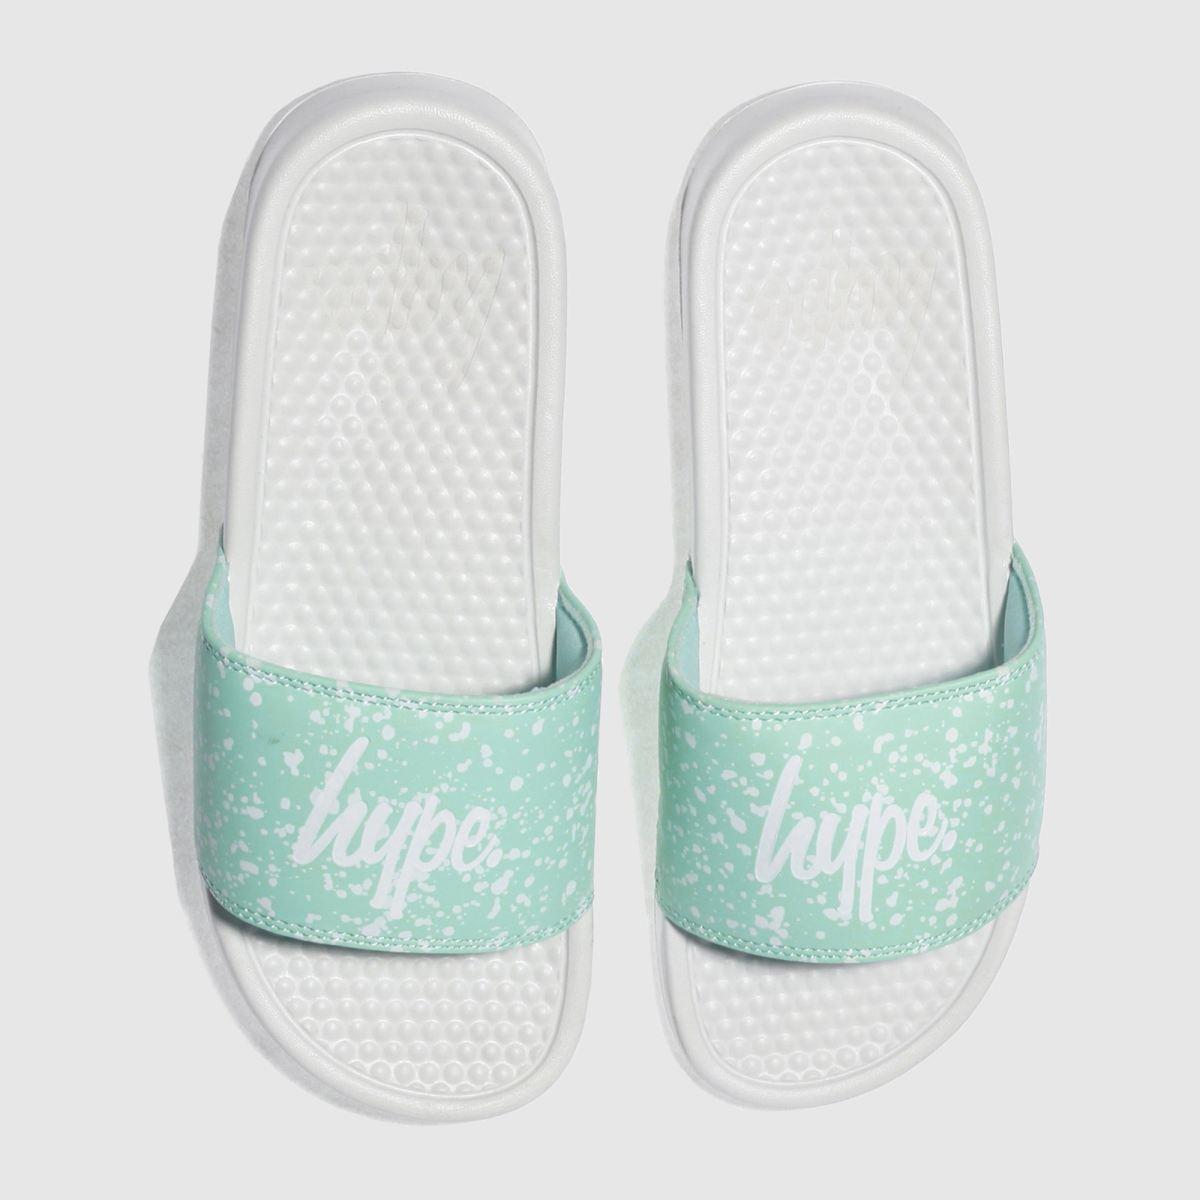 Hype Hype Light Green Speckle Slider Sandals